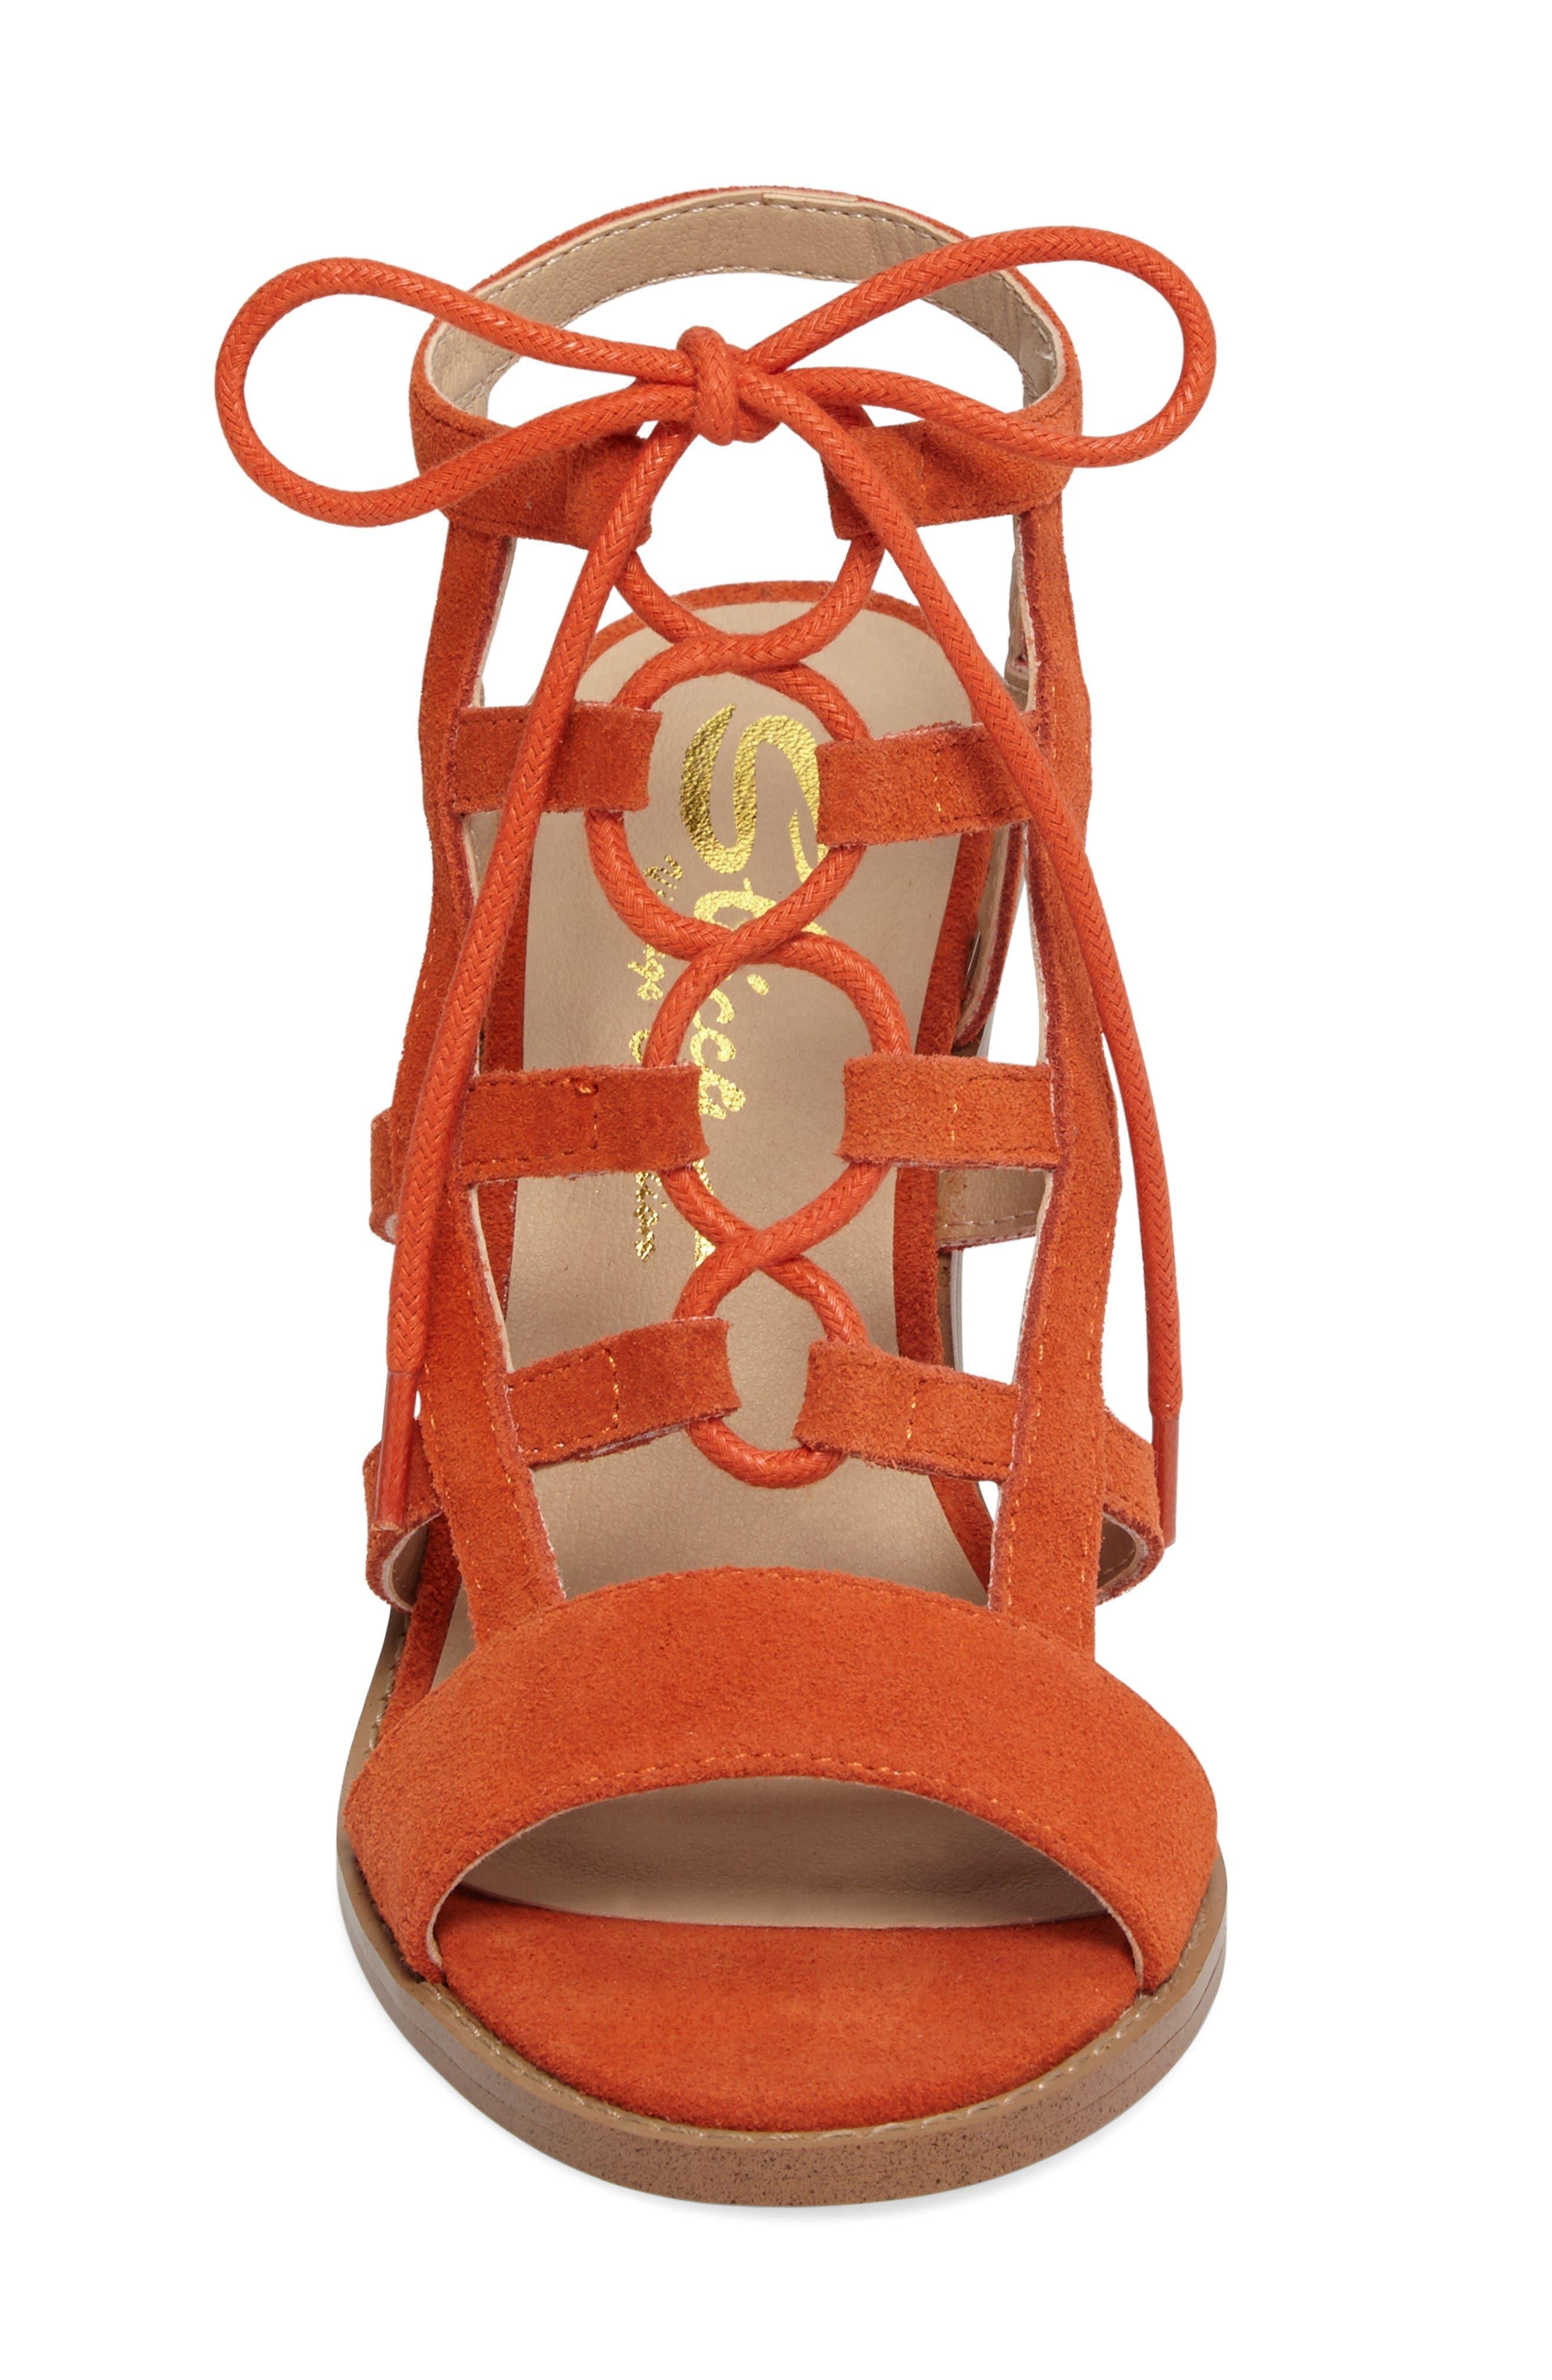 Sanni Cage Sandal,                             Alternate thumbnail 4, color,                             Orange Leather